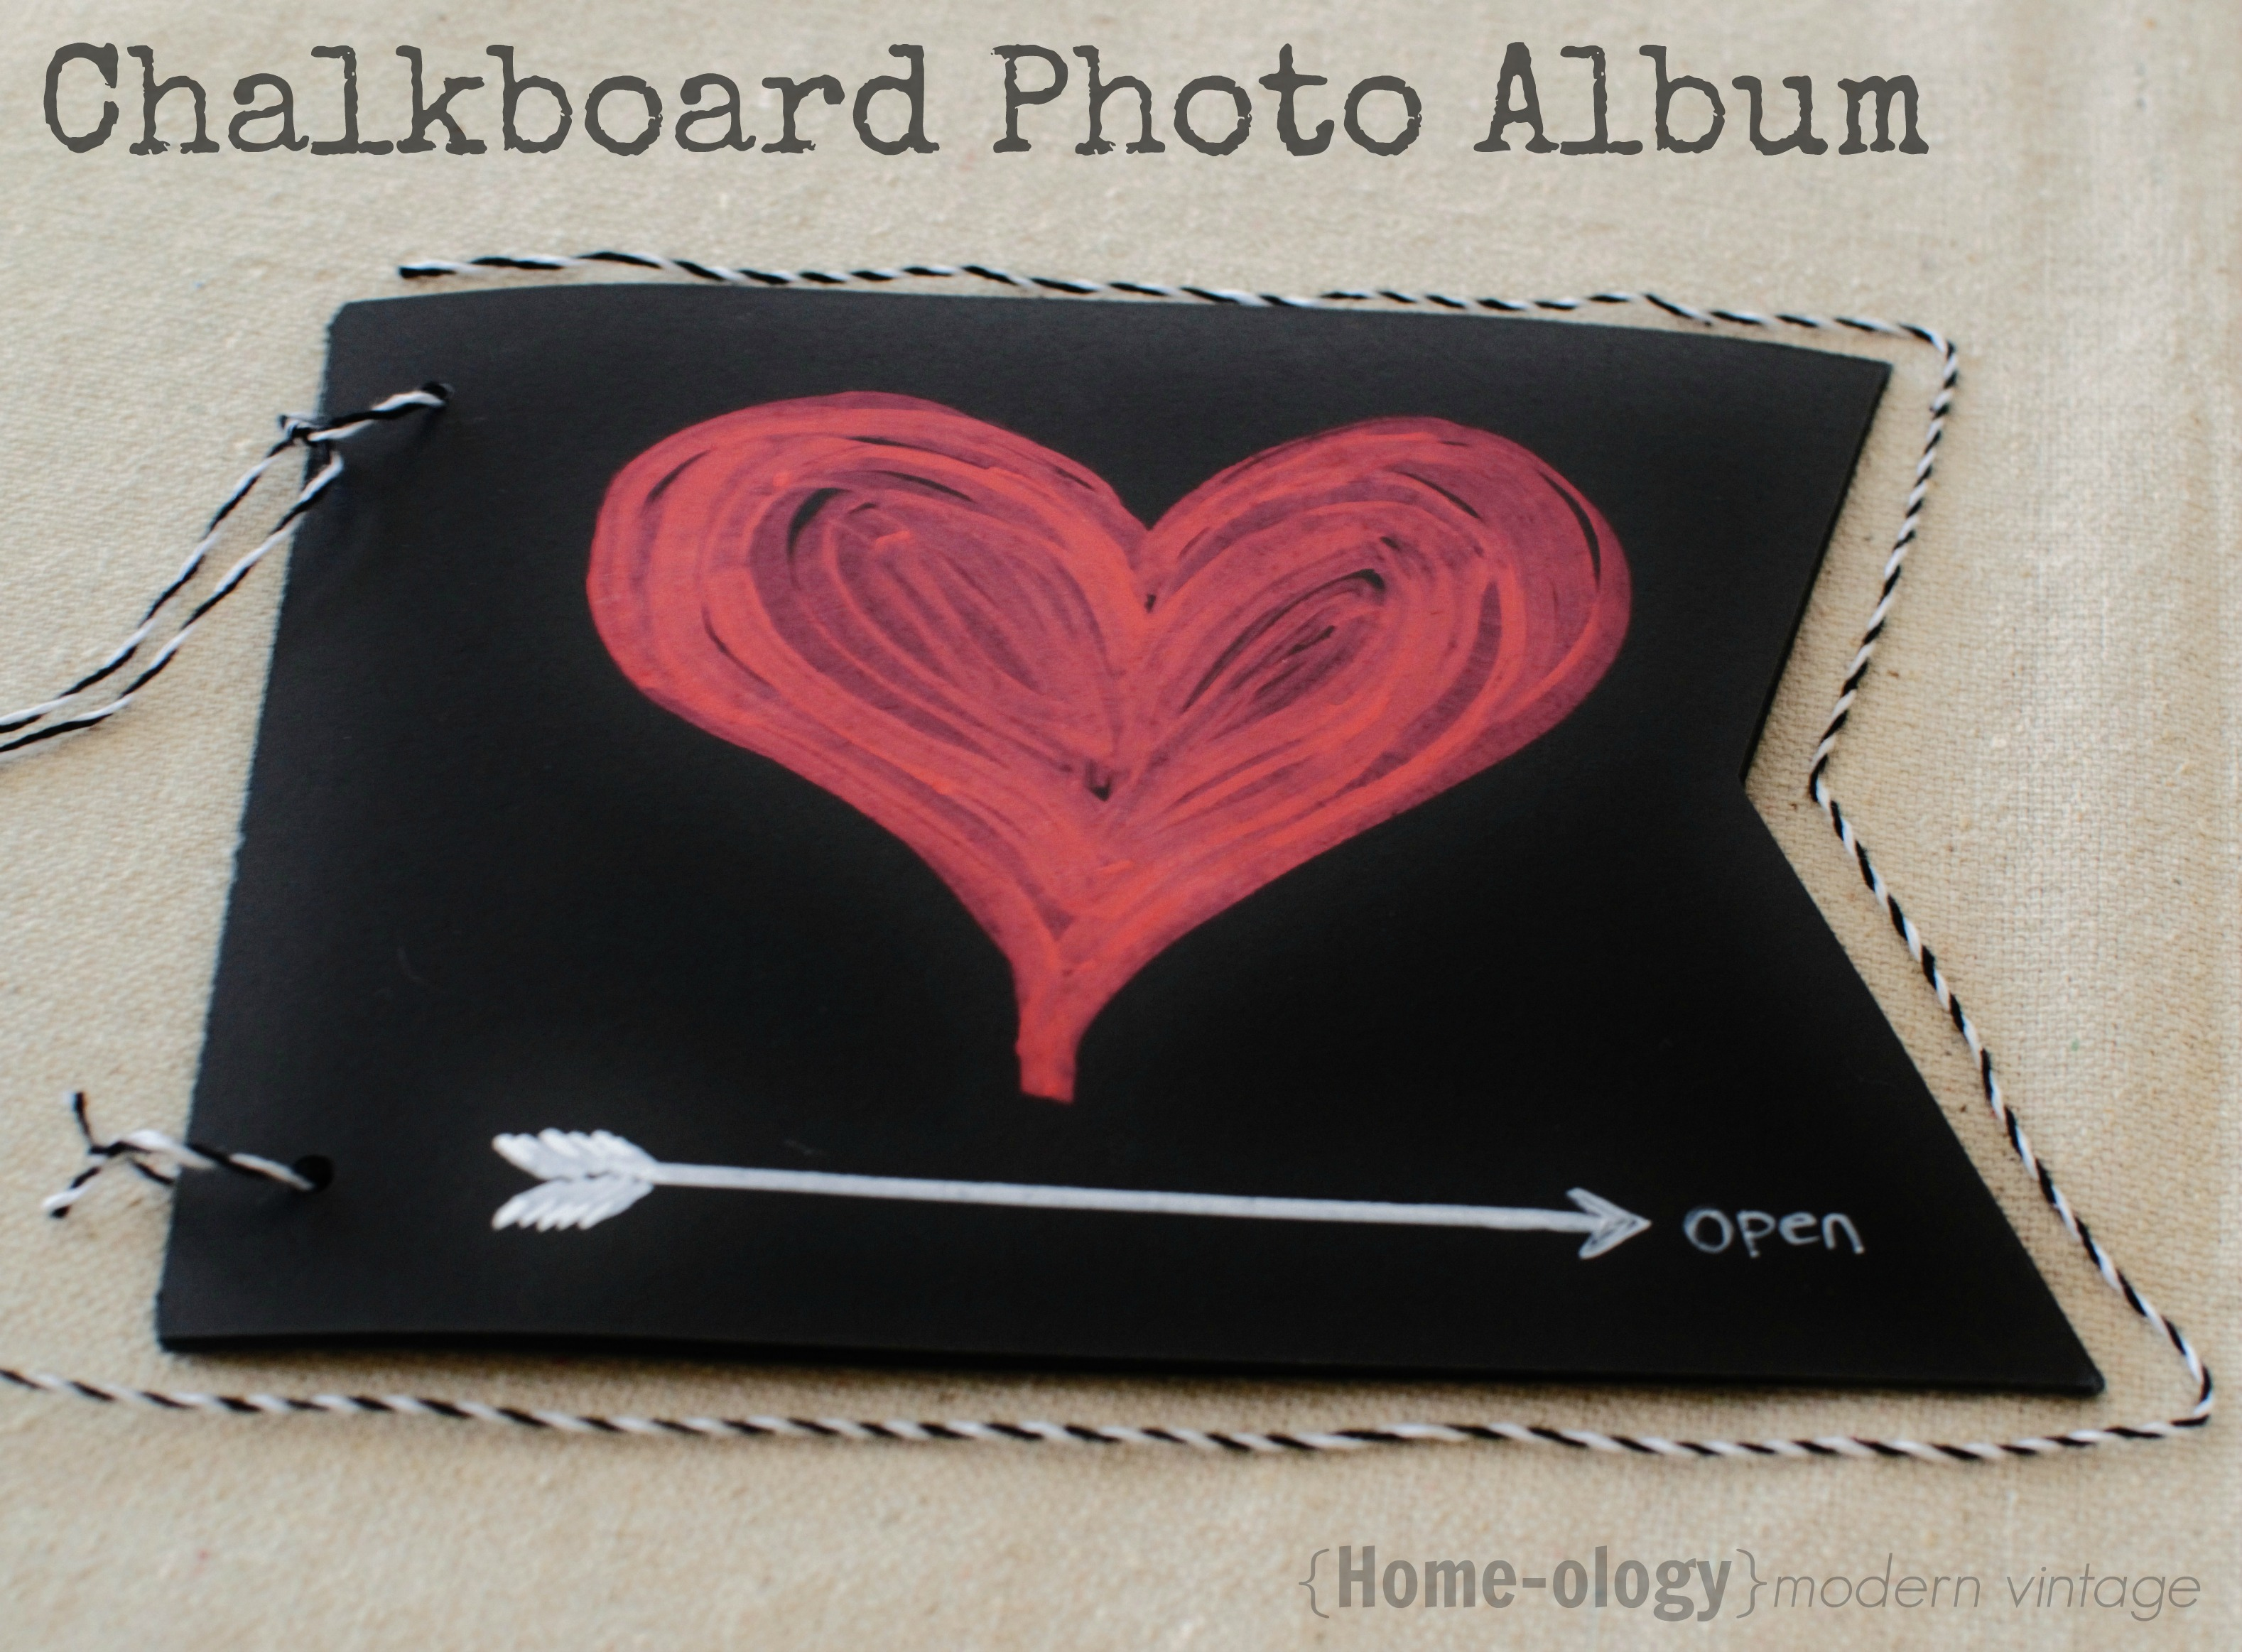 chalkboard photo album using resuable chalkboard banner paper